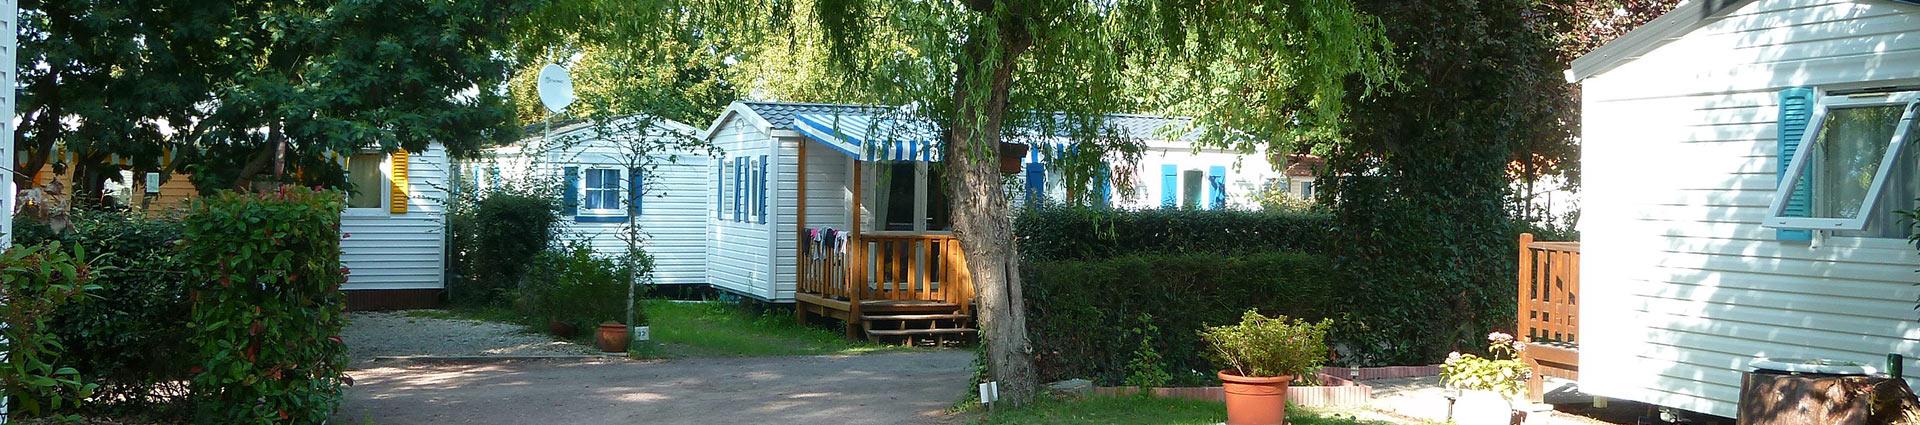 location de mobilhome camping St Hilaire de Riez